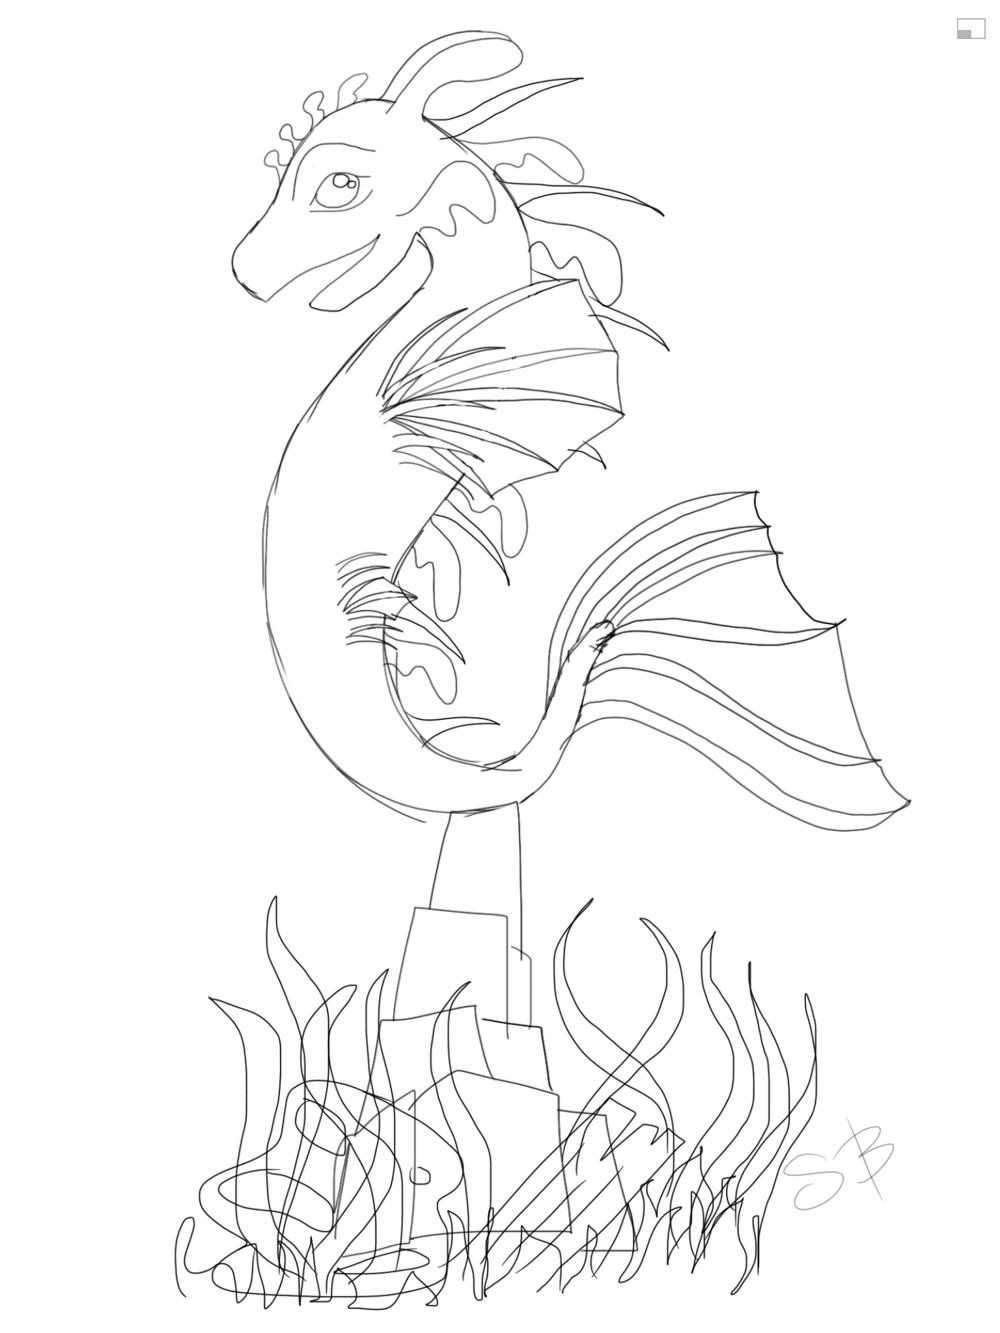 Lion Fish/Leafy Sea Dragon - image 5 - student project